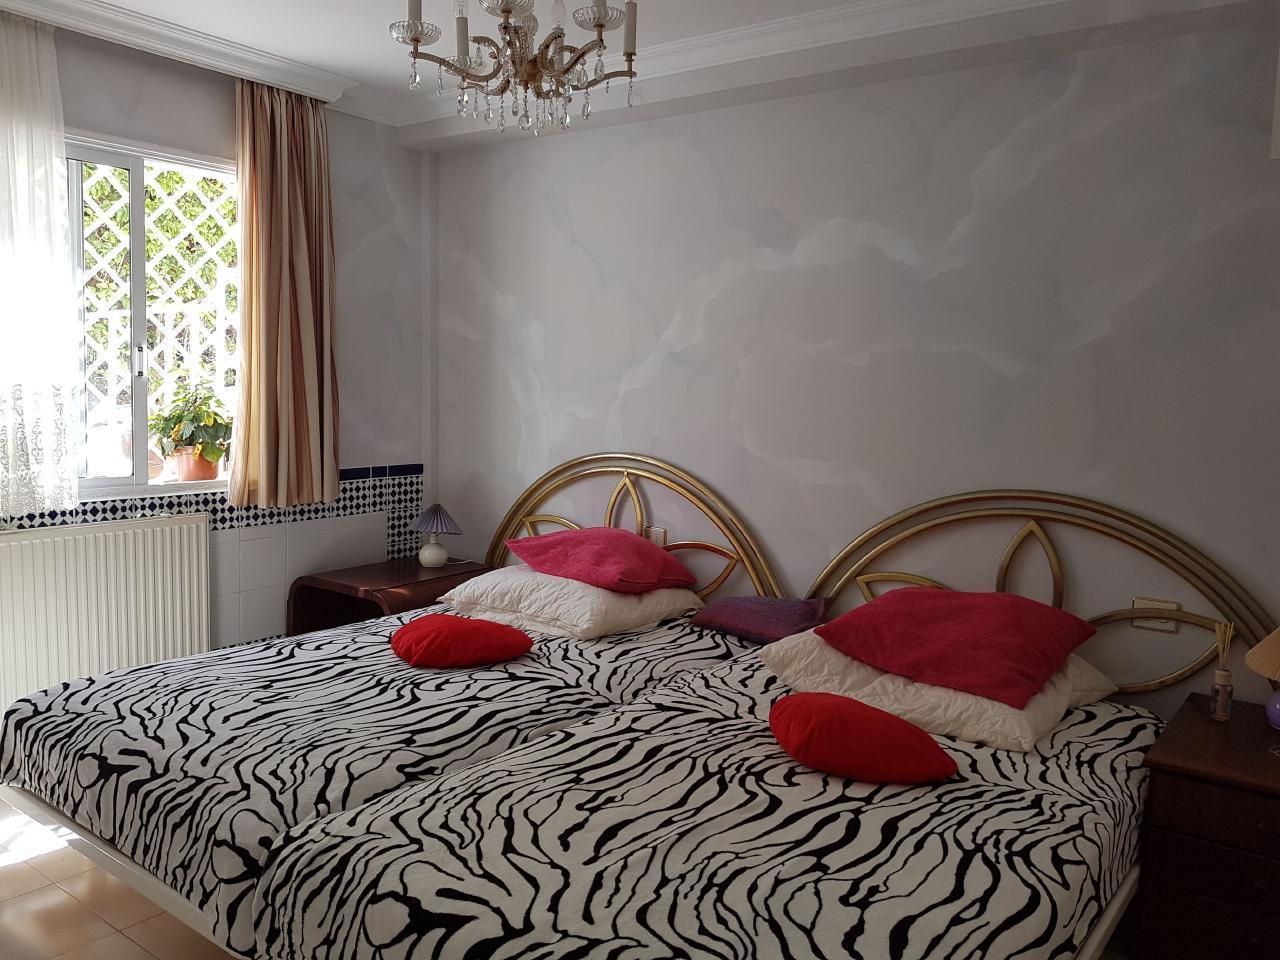 Appartement de vacances Villa Larnia Familien Apartment   * Urlaub für Körper, Geist und Seele * (2529406), El Sauzal, Ténérife, Iles Canaries, Espagne, image 39